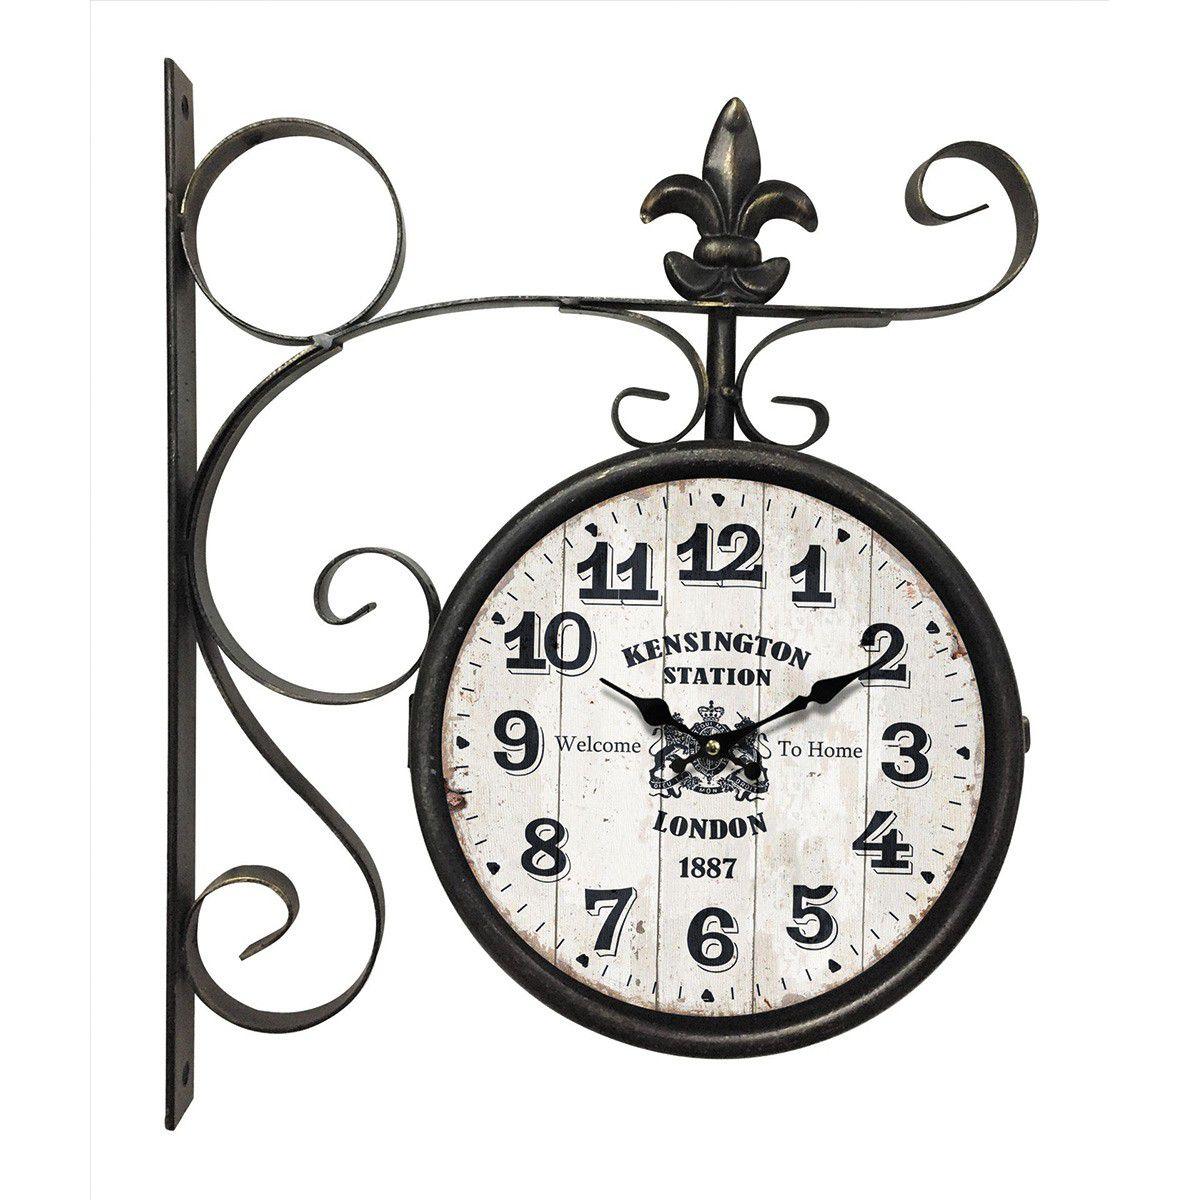 Relógio de parede dupla face Kensington London 1887